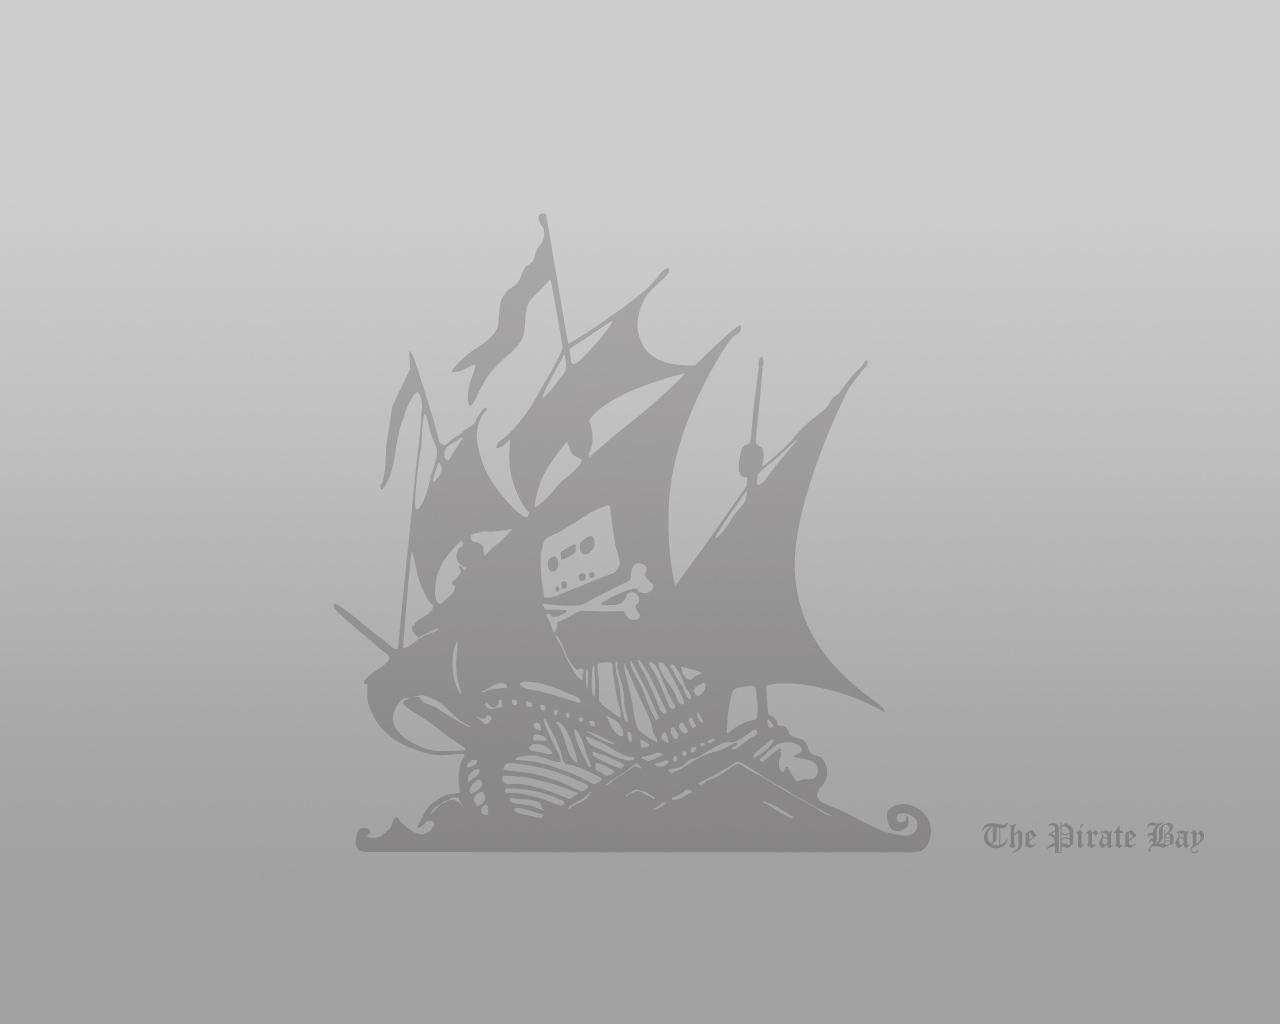 6474 descargar fondo de pantalla Barcos, Imágenes: protectores de pantalla e imágenes gratis